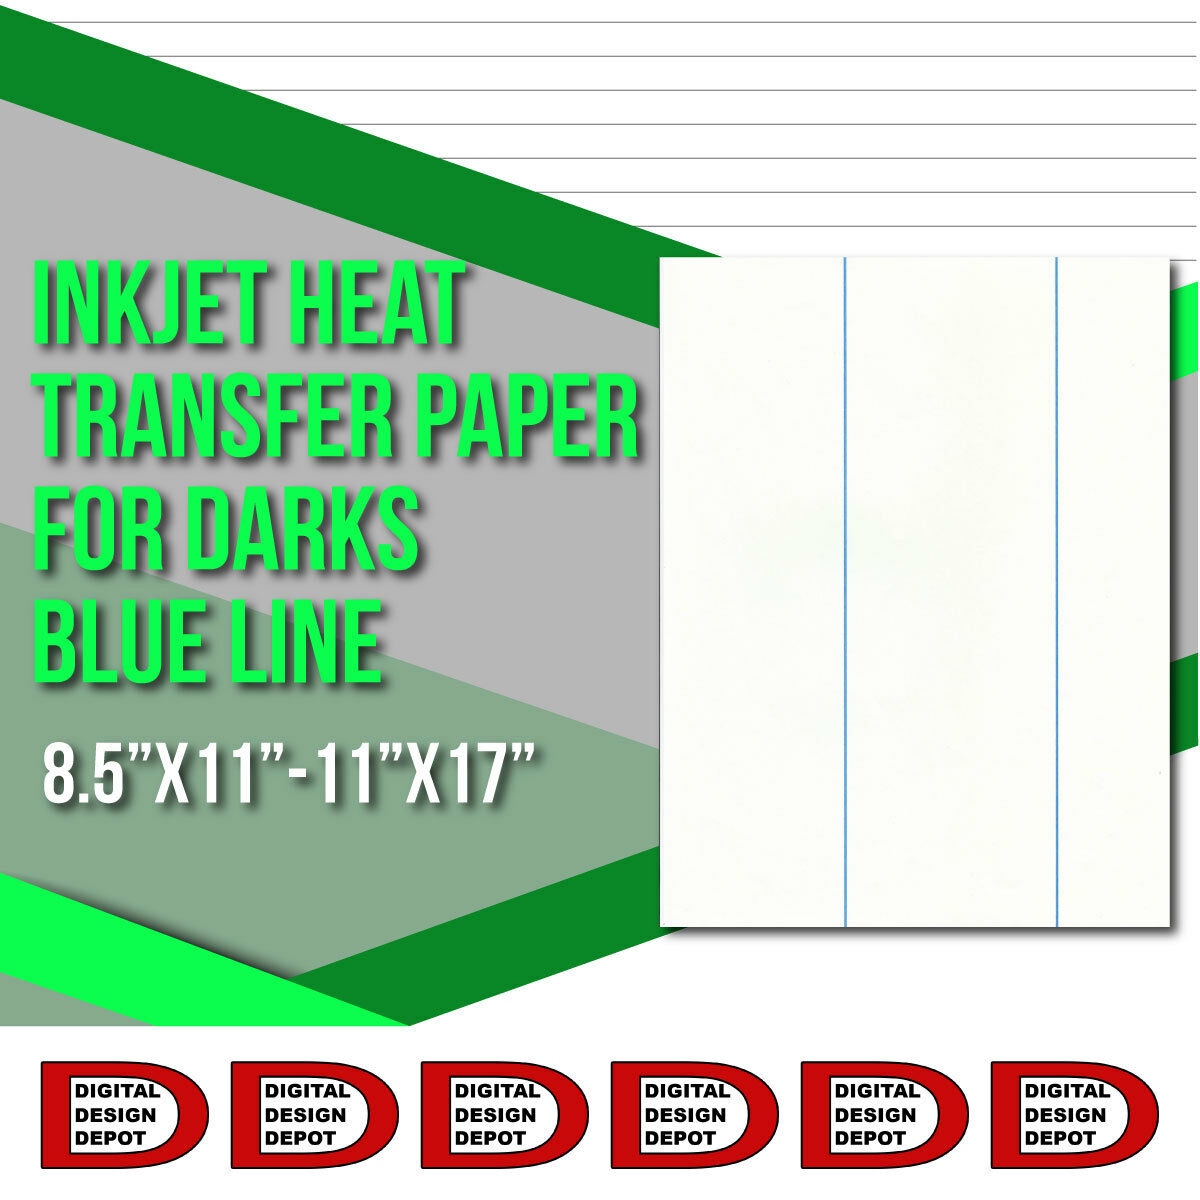 PHOTO TRANS SC Laser Heat Transfer Paper 11x17 50 XEROX DOCUCOLOR 12 fuser oil